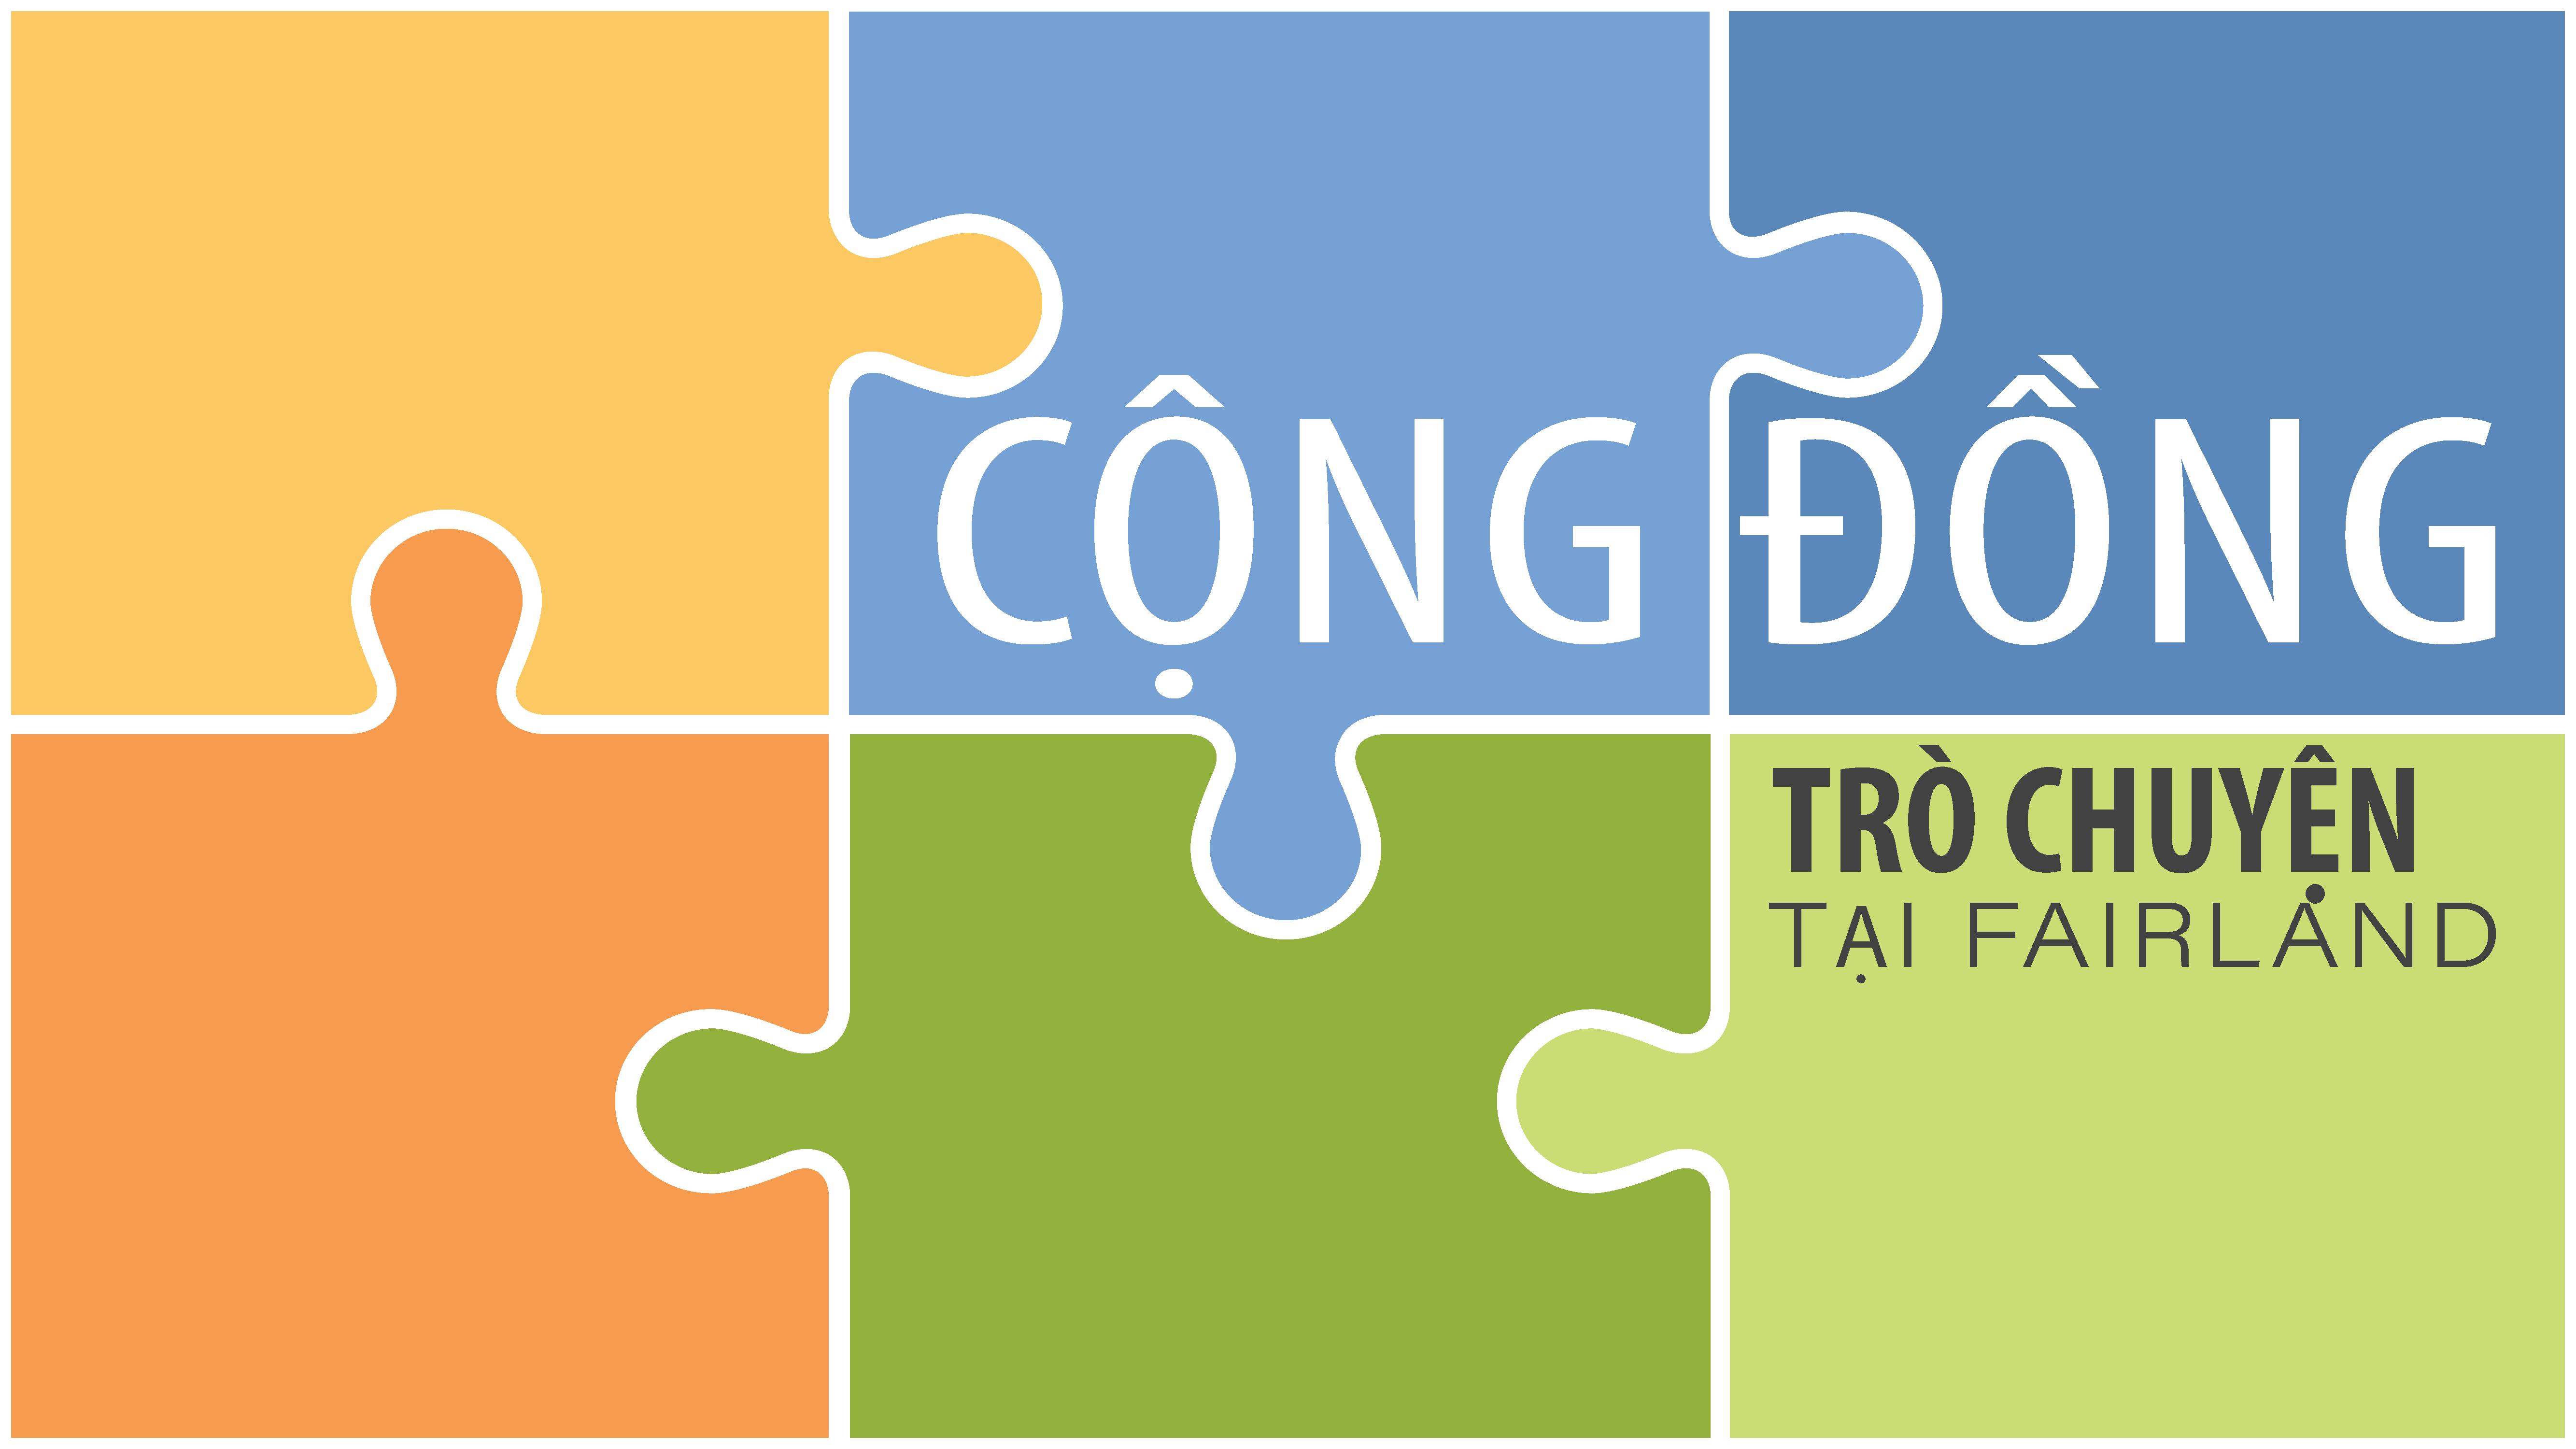 CommUNITY Conversations in Fairland Vietnamese